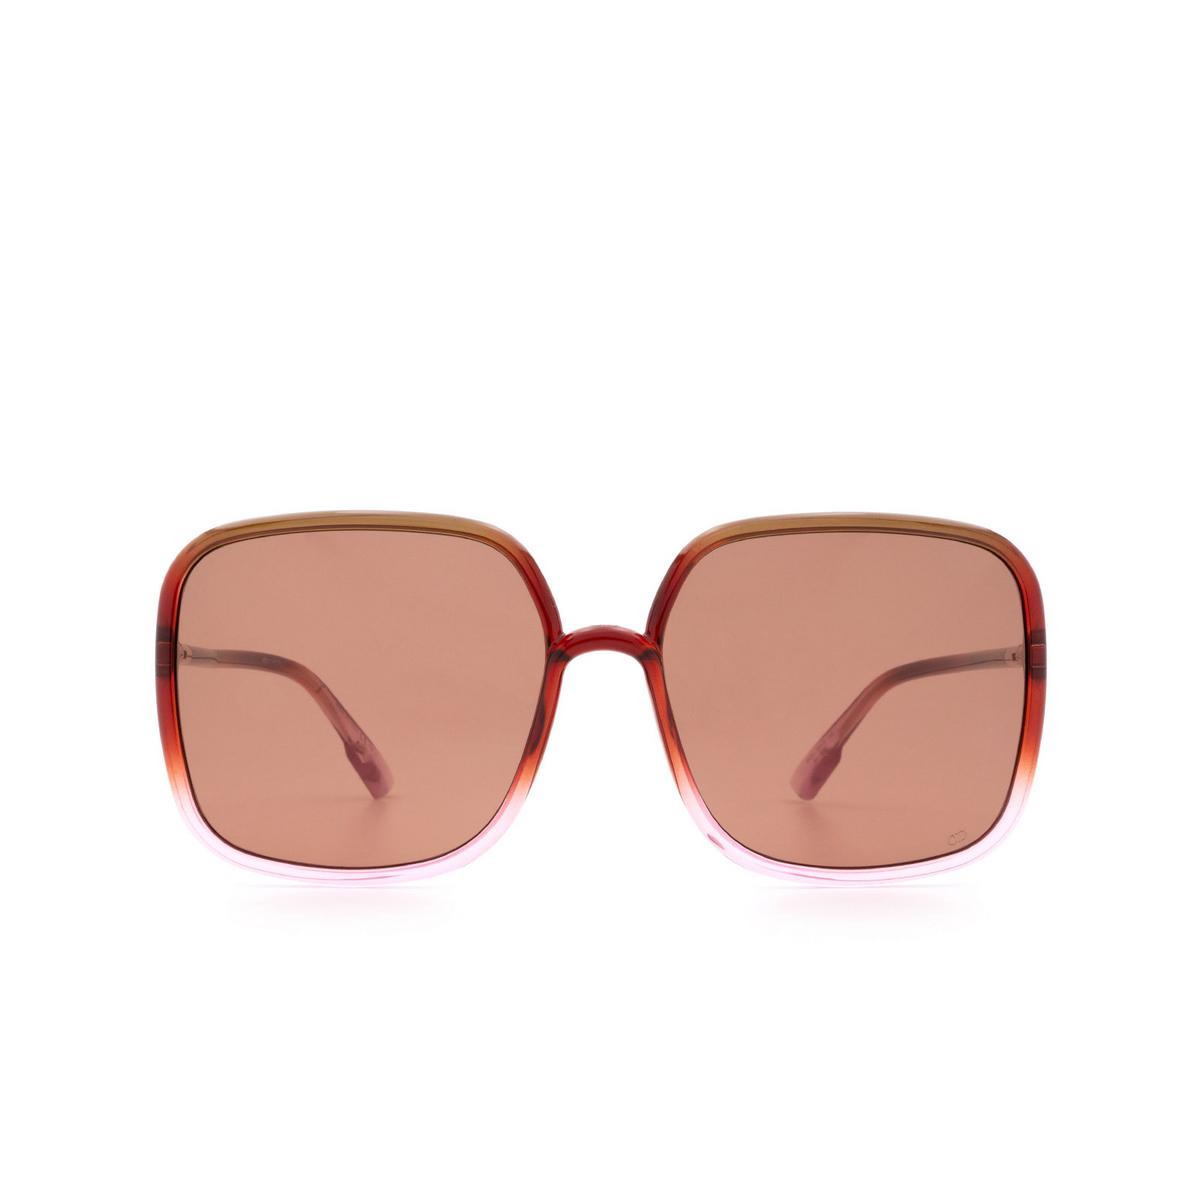 Dior® Square Sunglasses: SOSTELLAIRE1 color Brown Gradient Pink 59I/ZK.